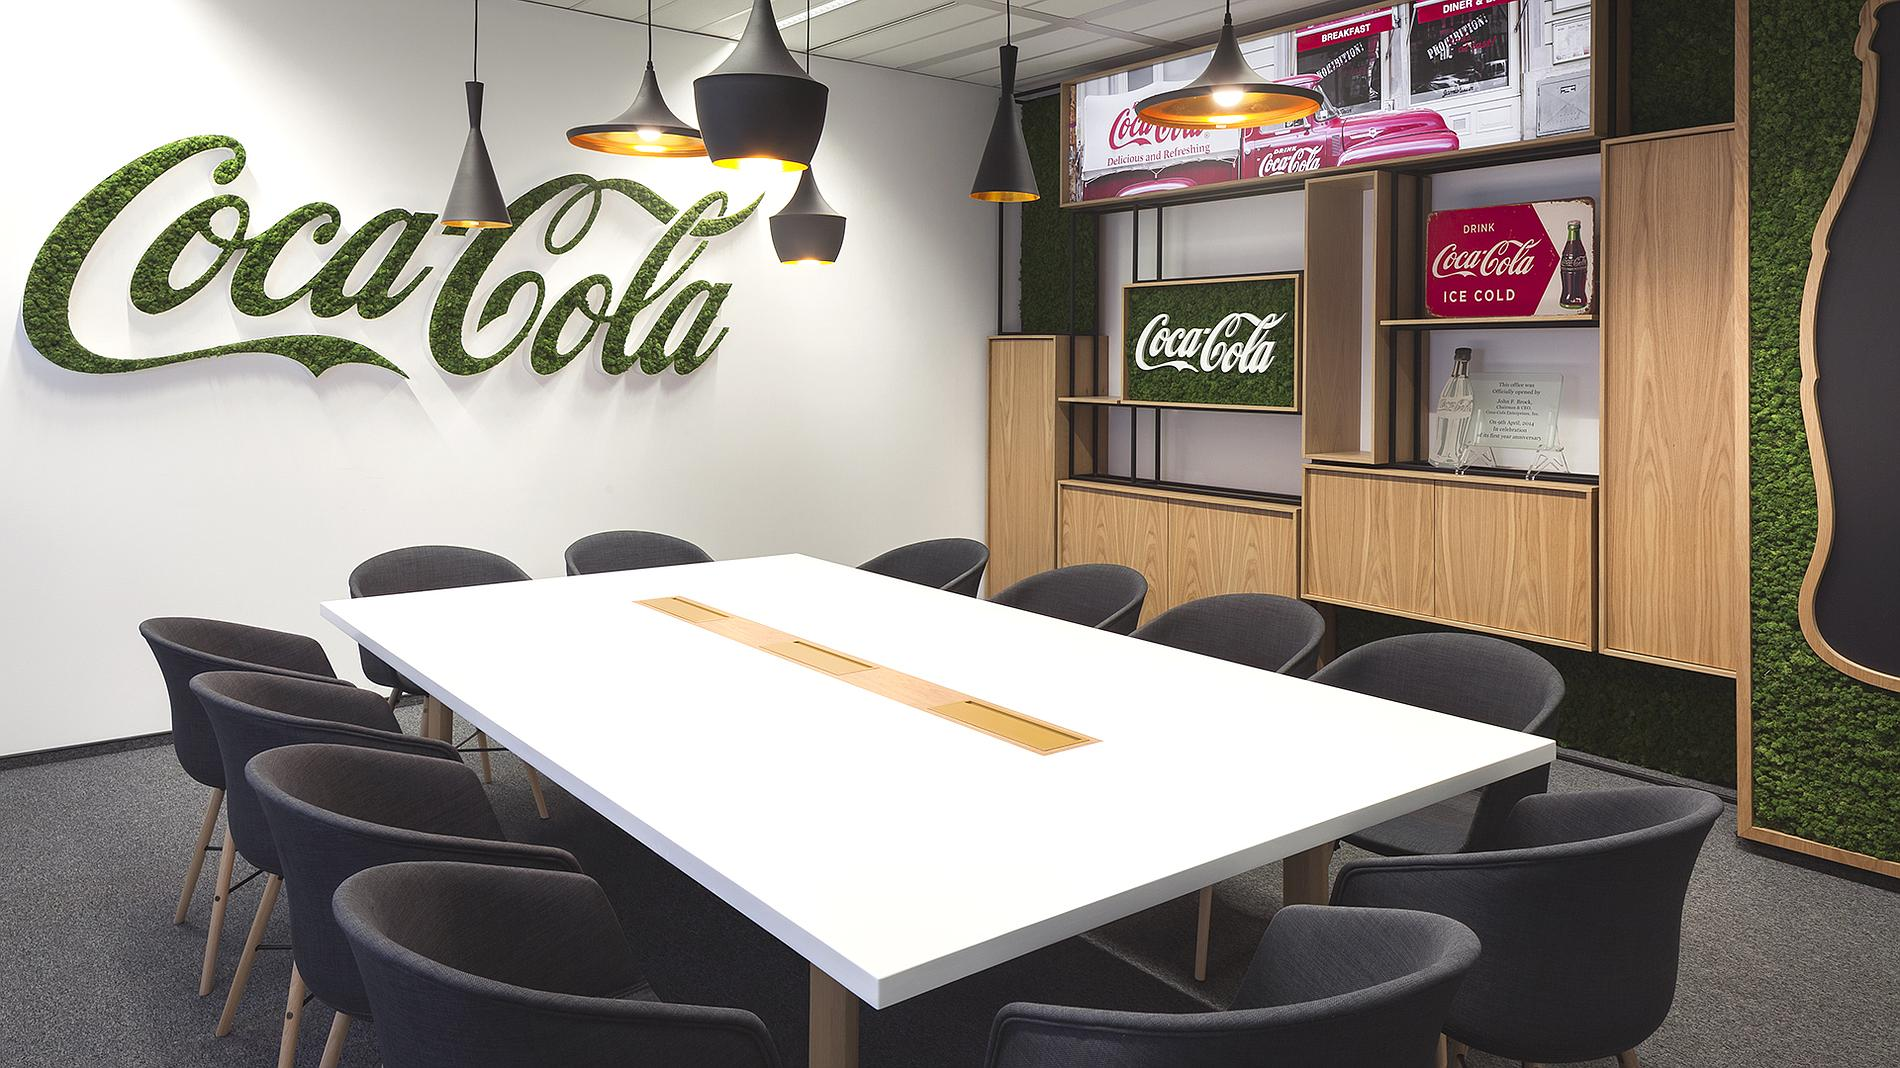 Coca-Cola interior design and branding, moss sign